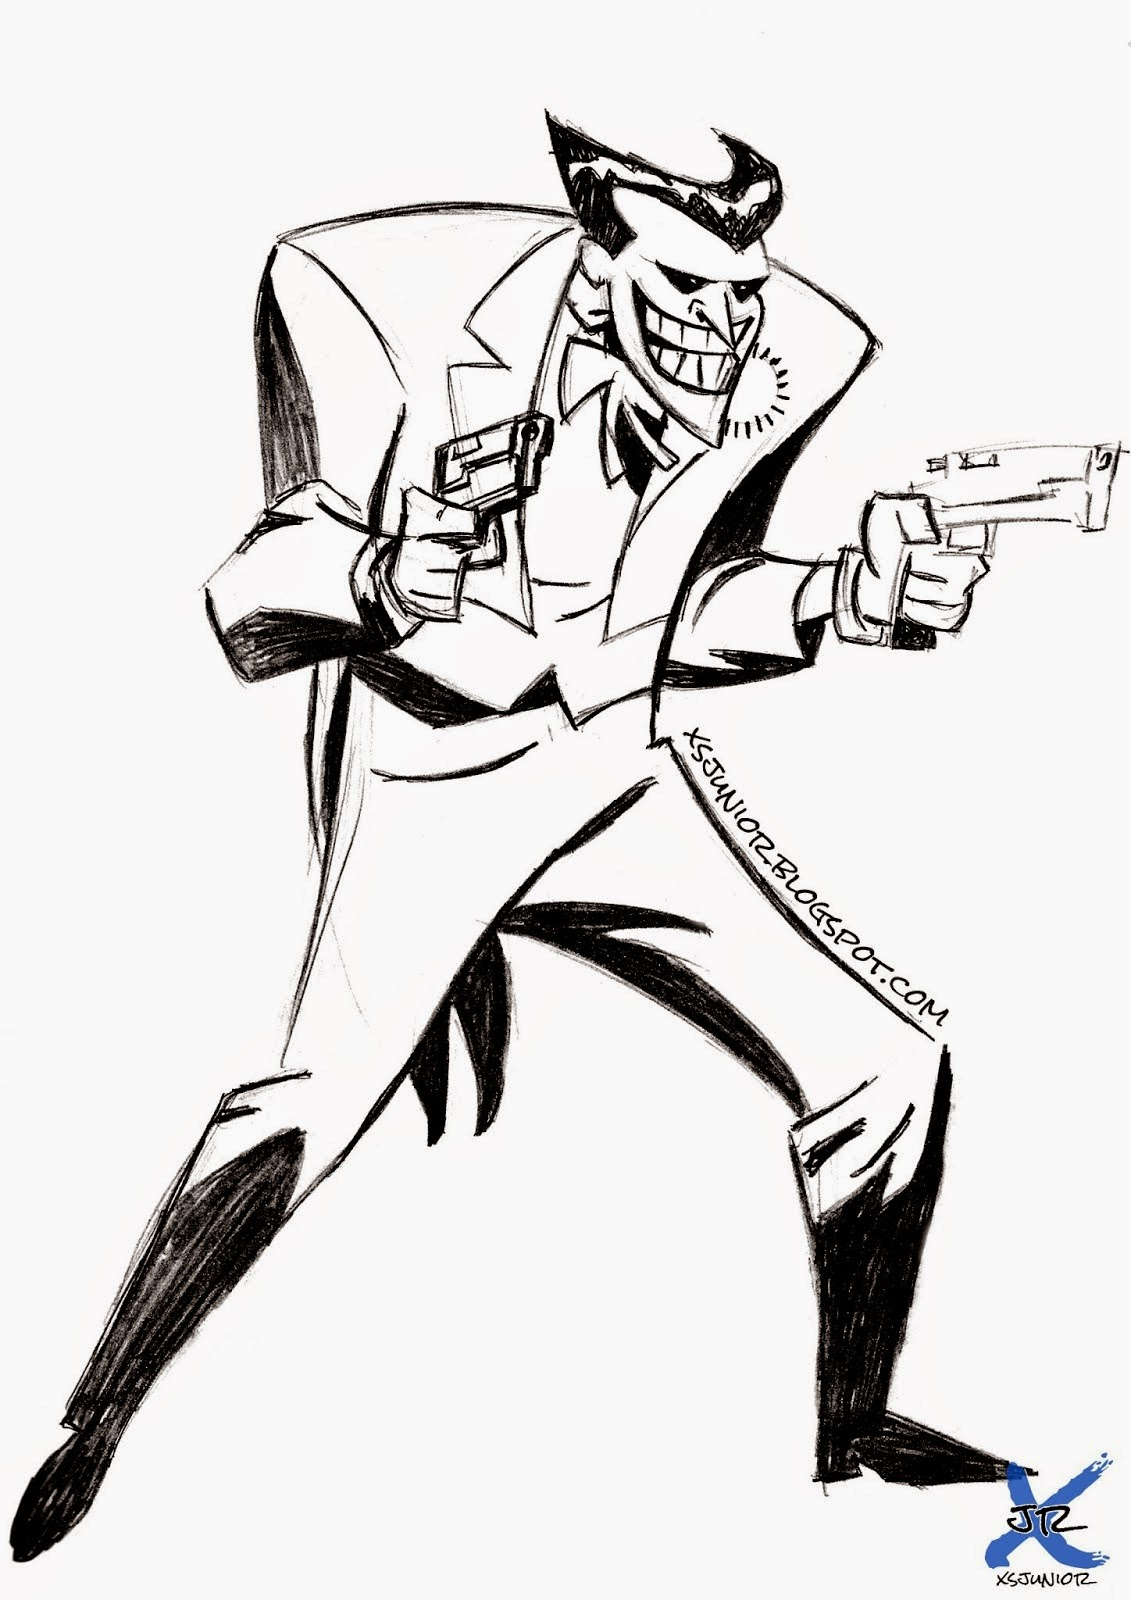 Dibujo con Lapiz: Dibujo del Joker para entrenar líneas y ...